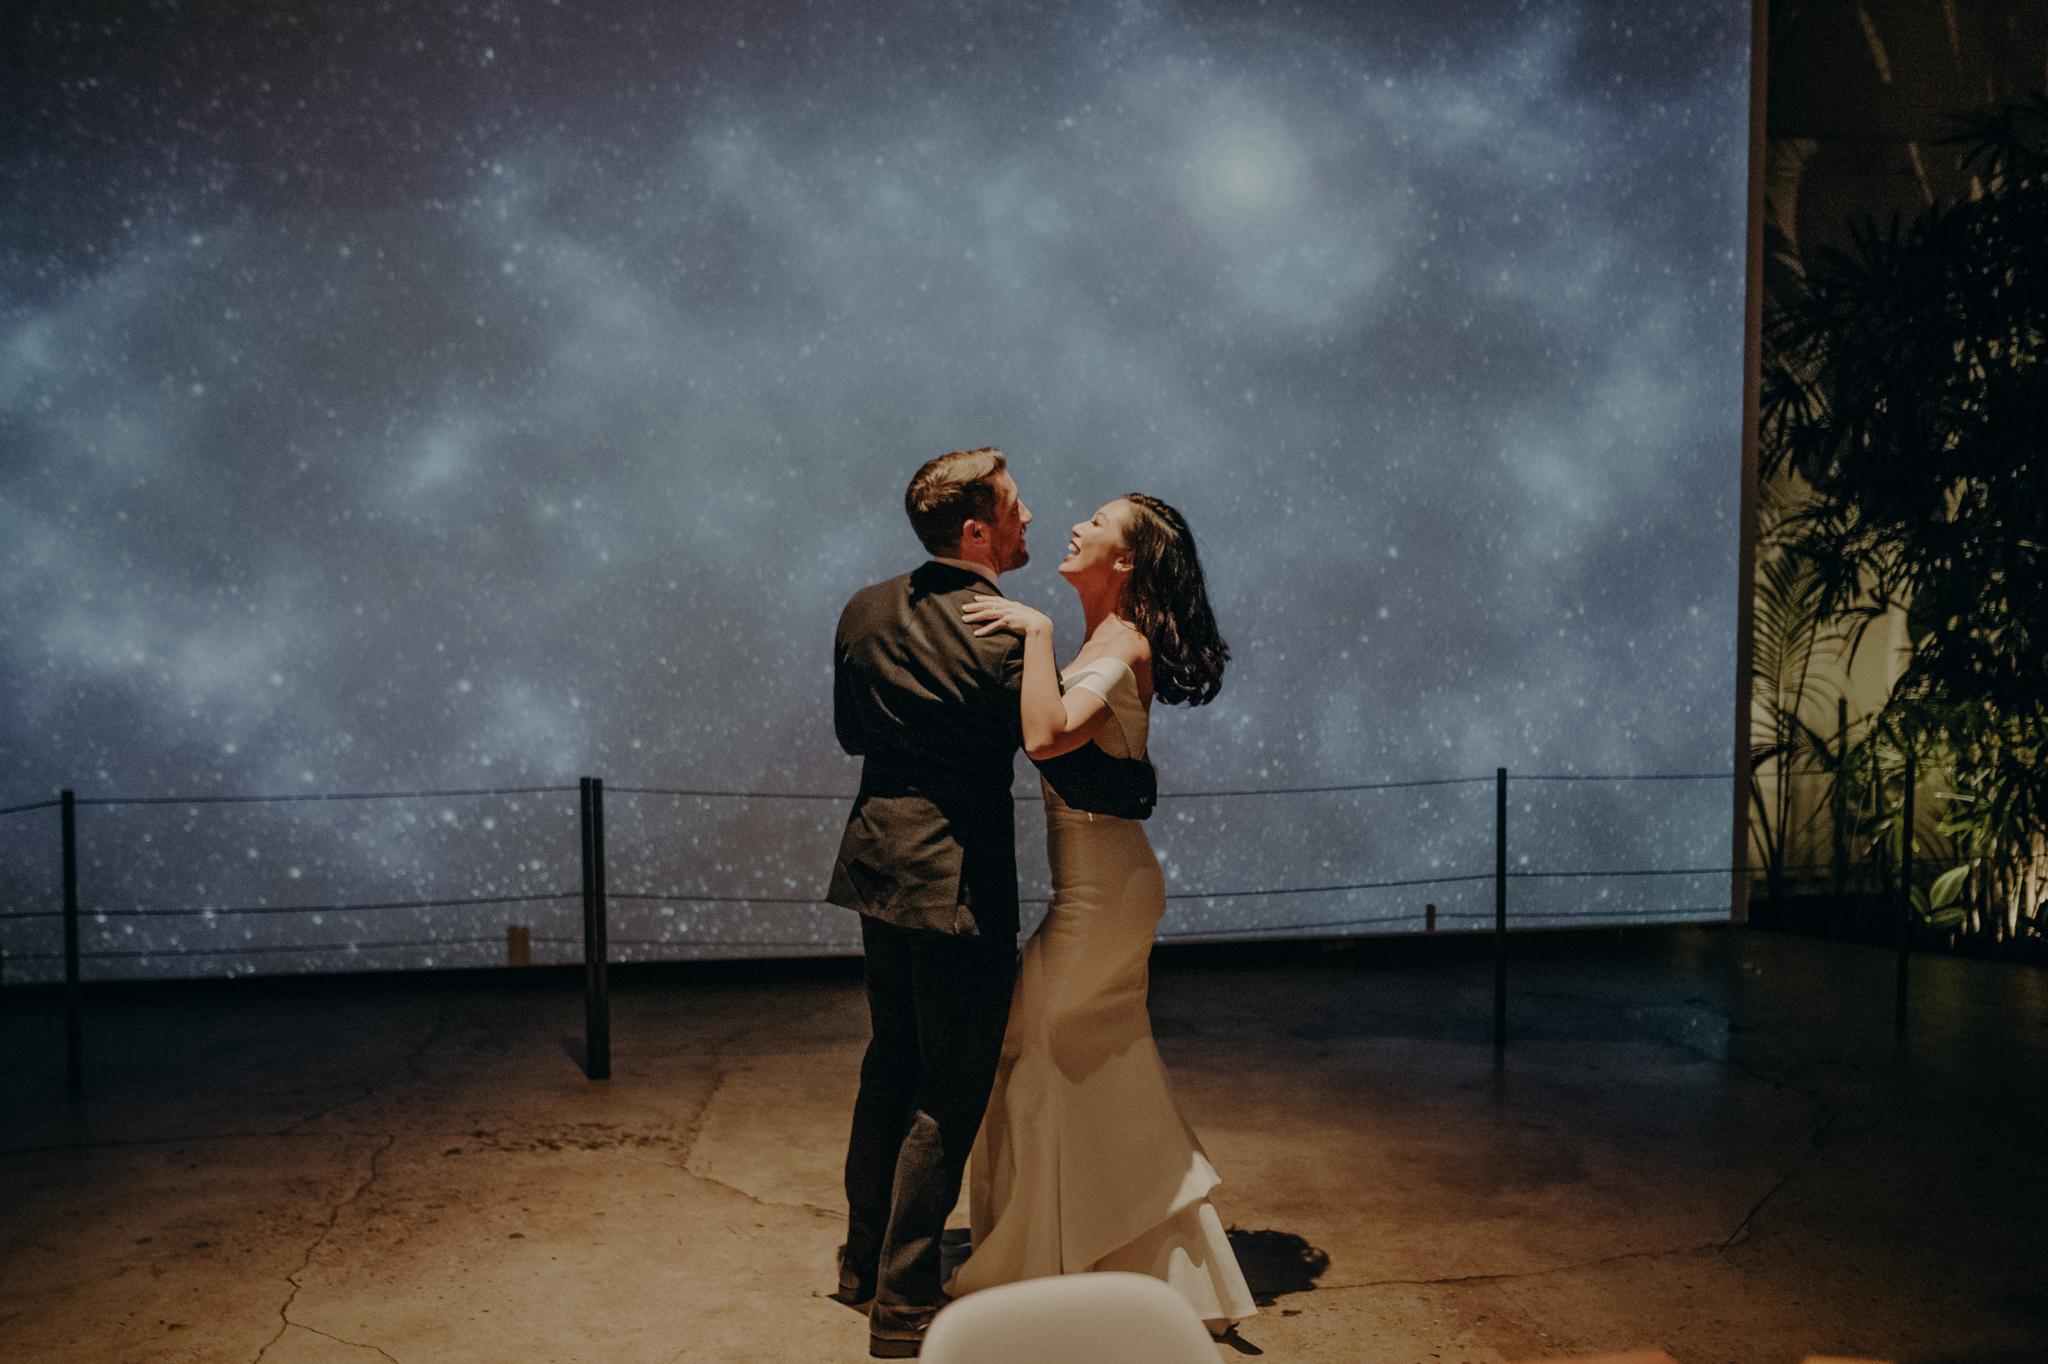 Wedding Photo LA - wedding photographer in los angeles - millwick wedding venue -isaiahandtaylor.com-119.jpg